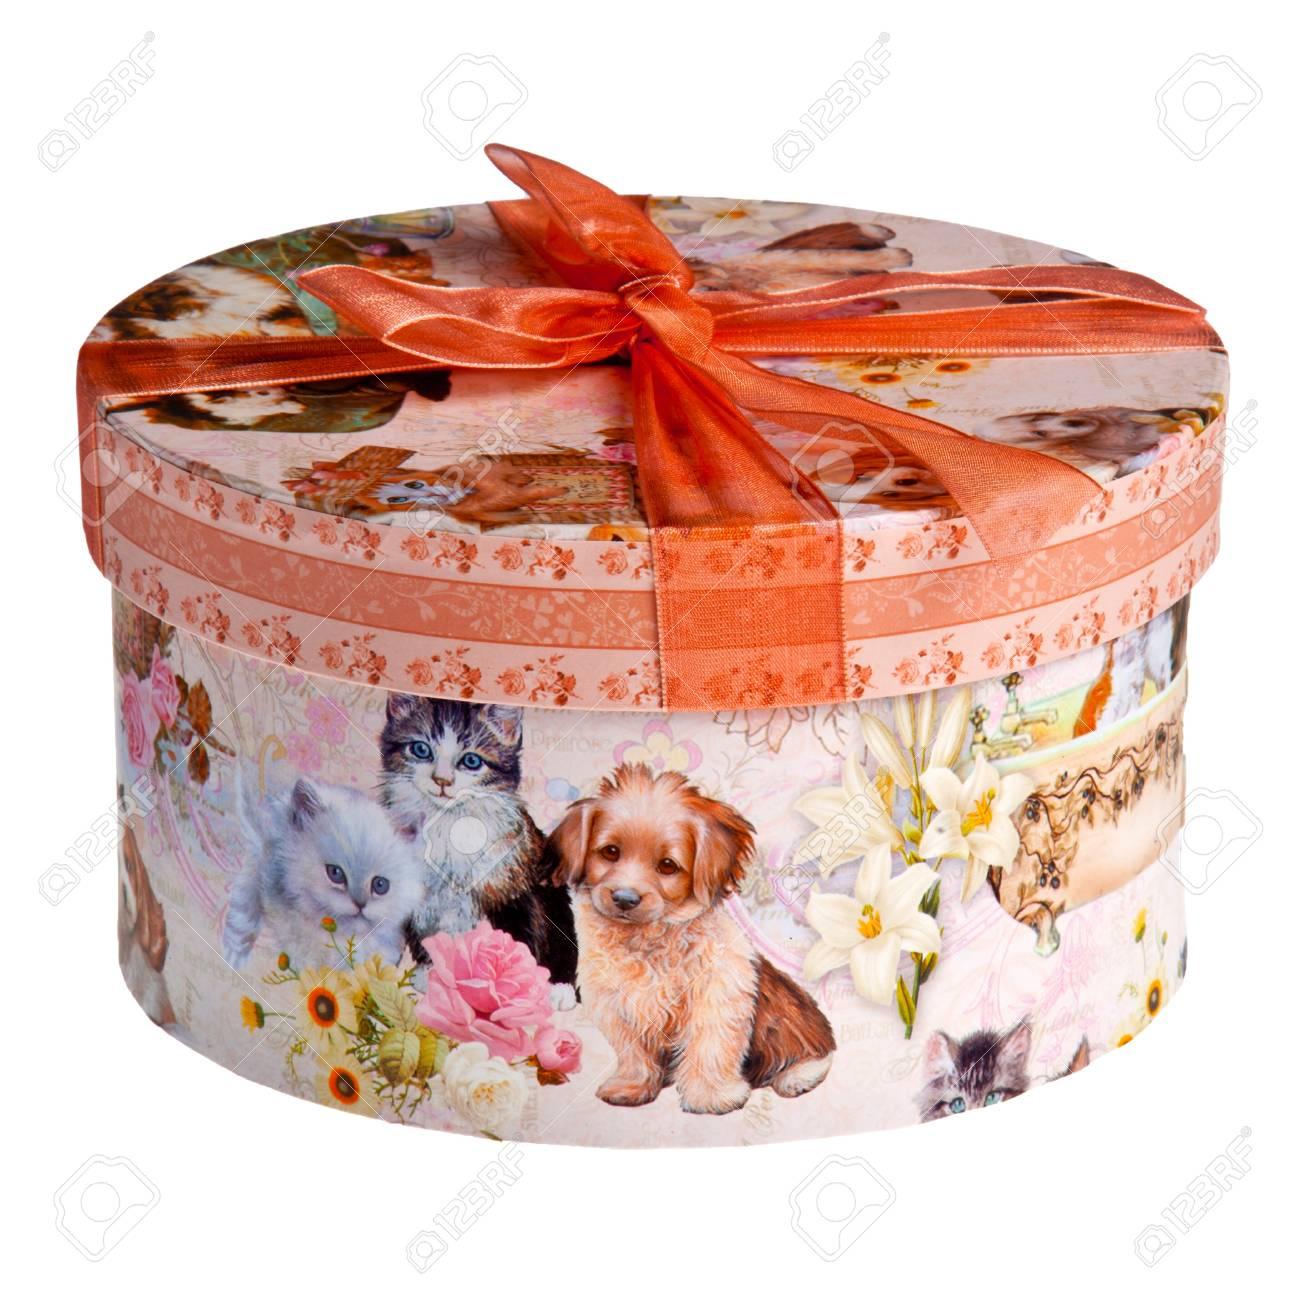 Holiday gift Stock Photo - 11554376